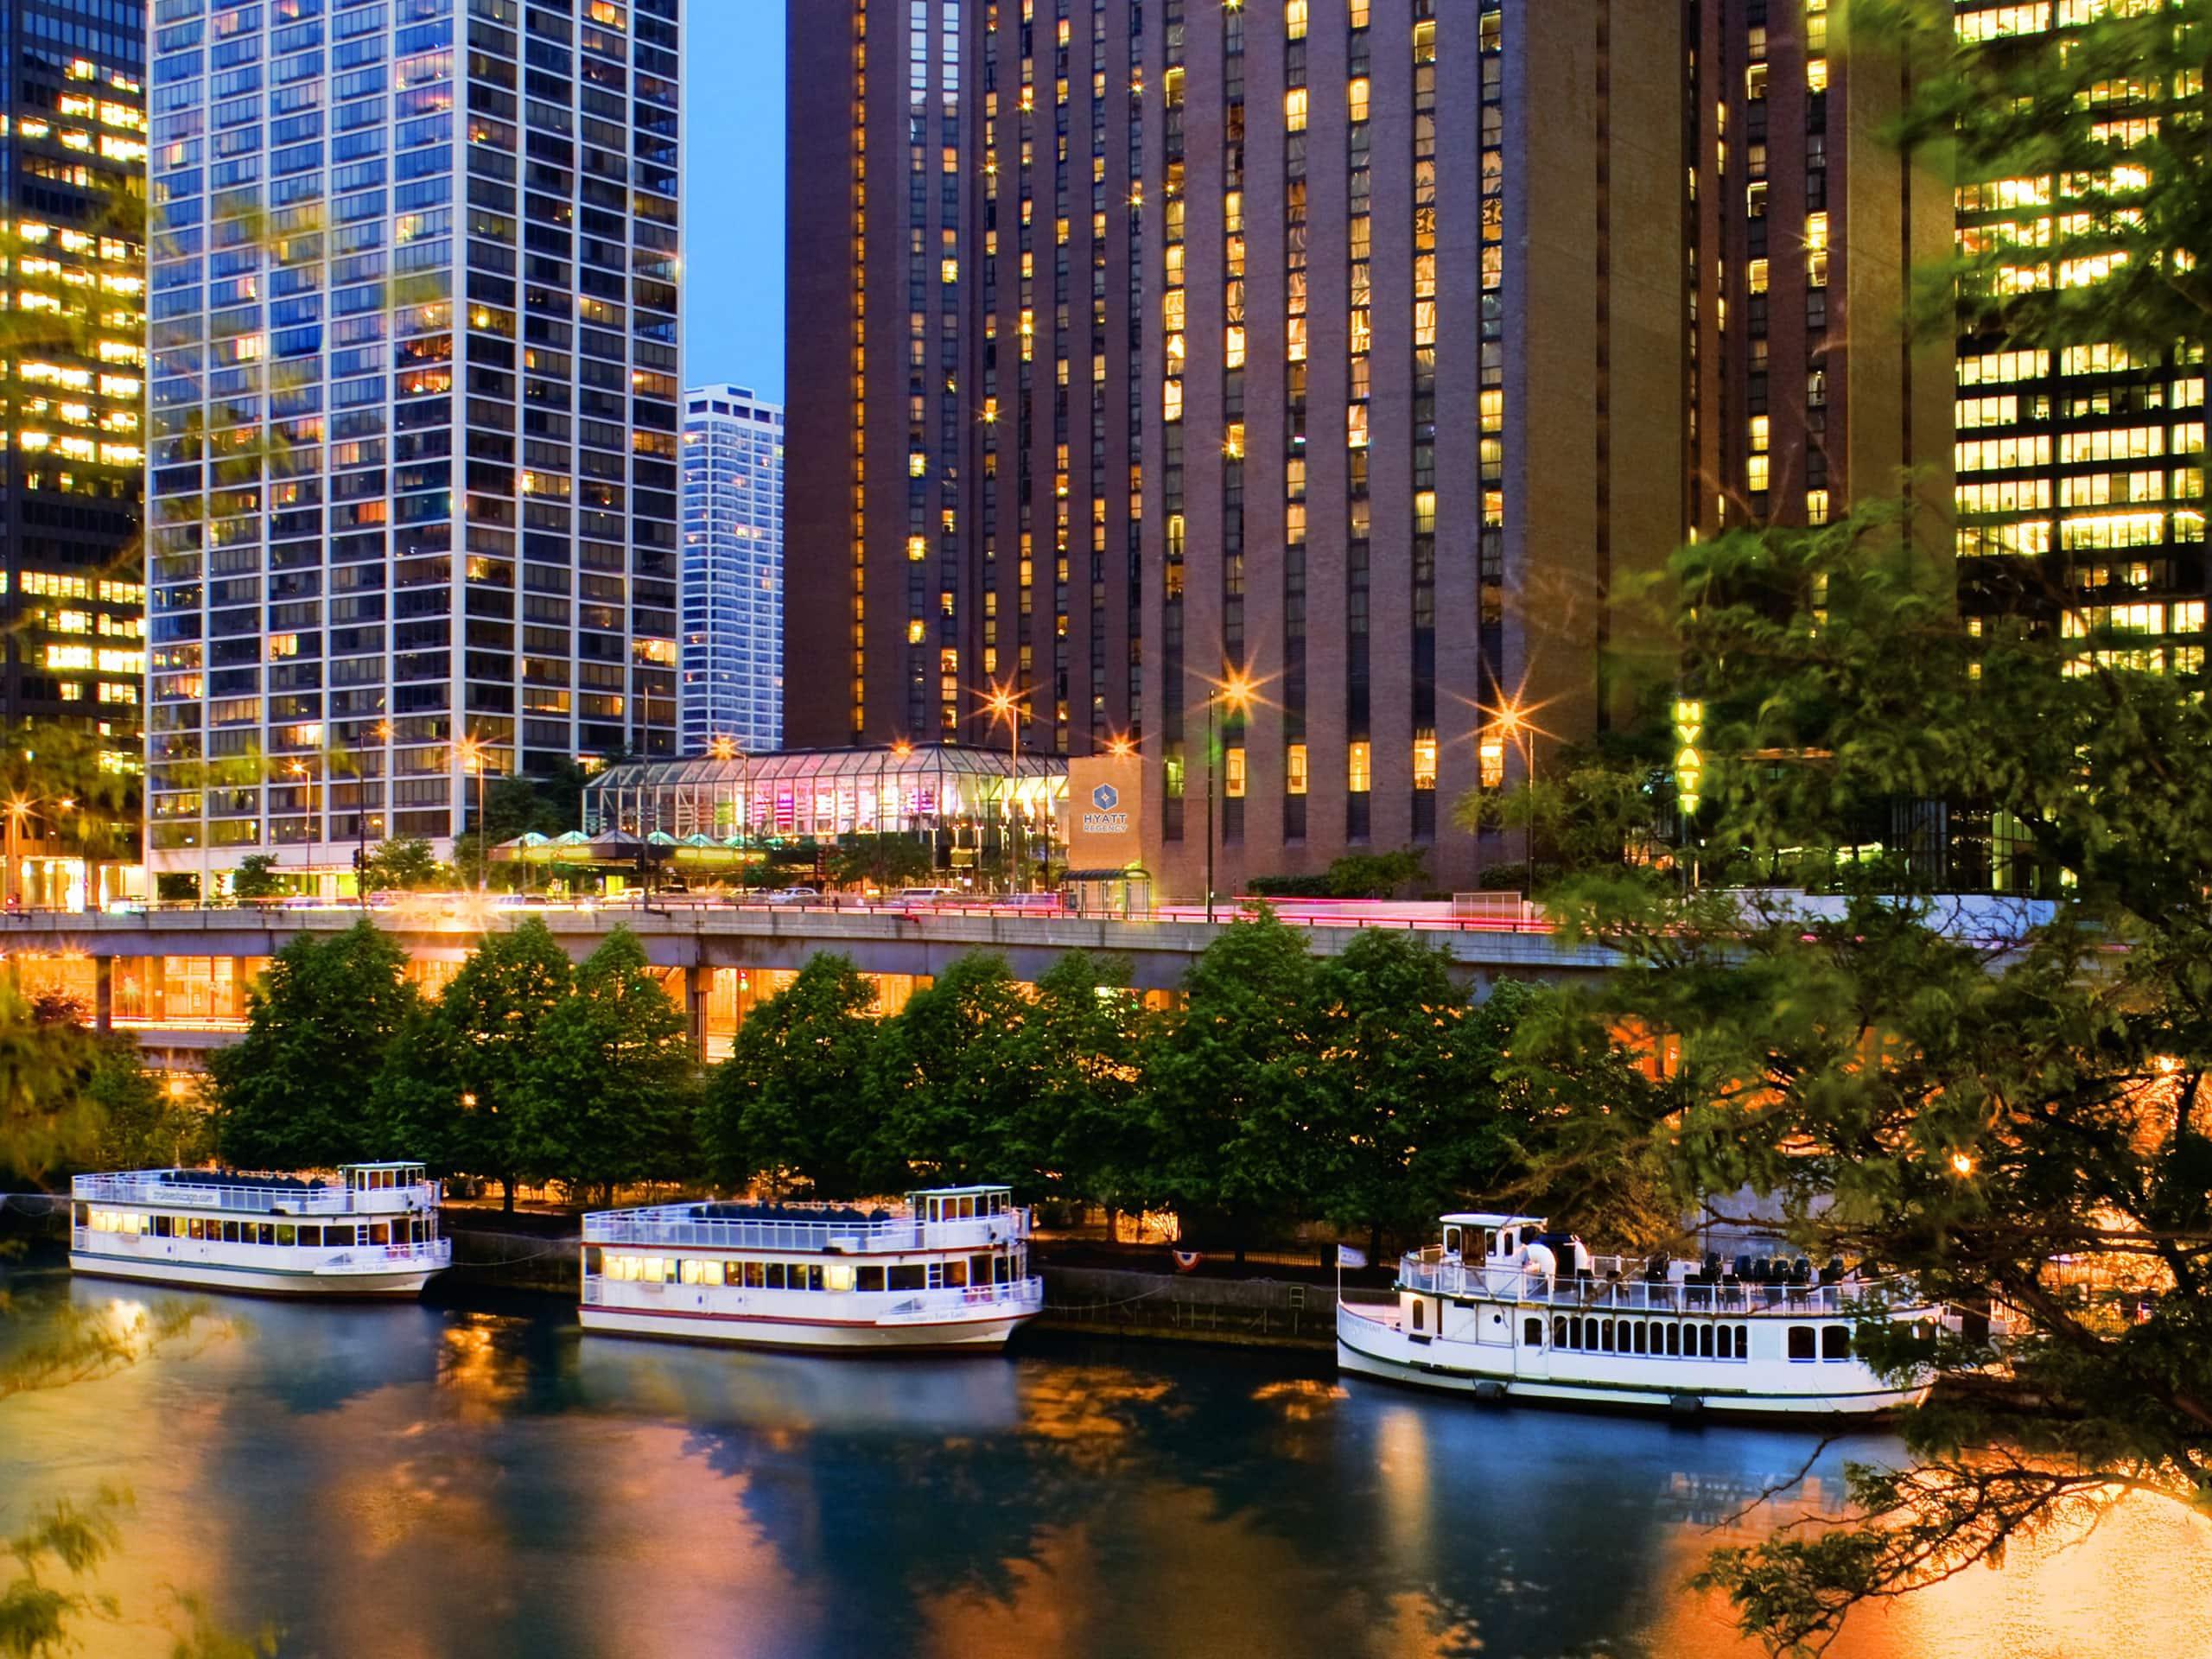 Fort mac dating scene in chicago